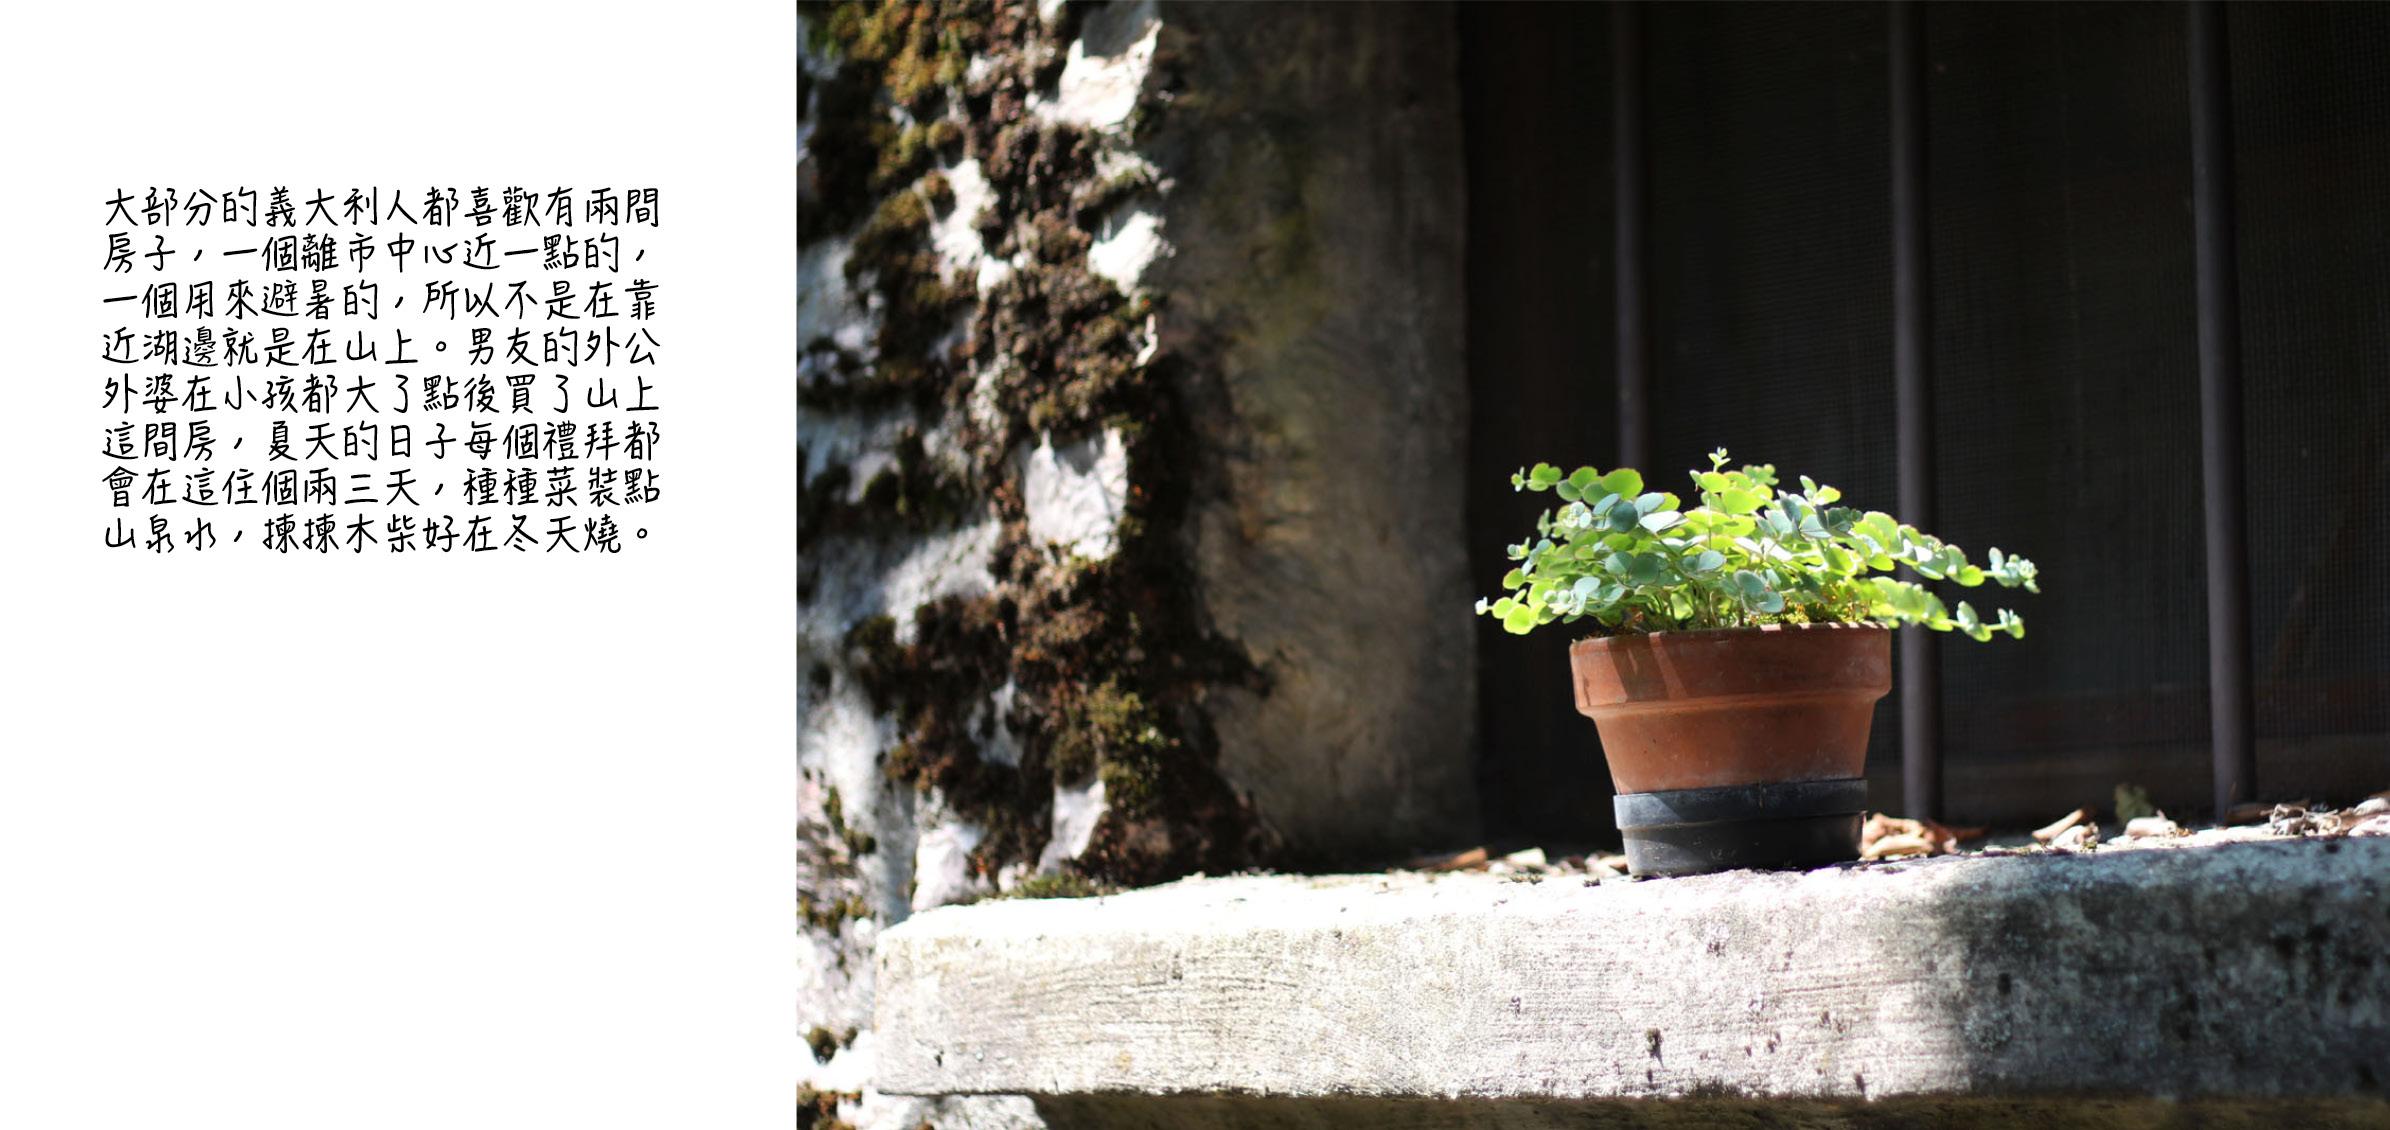 Rice & Shine - Travel Blog - Nonno's Terrace 4.jpg